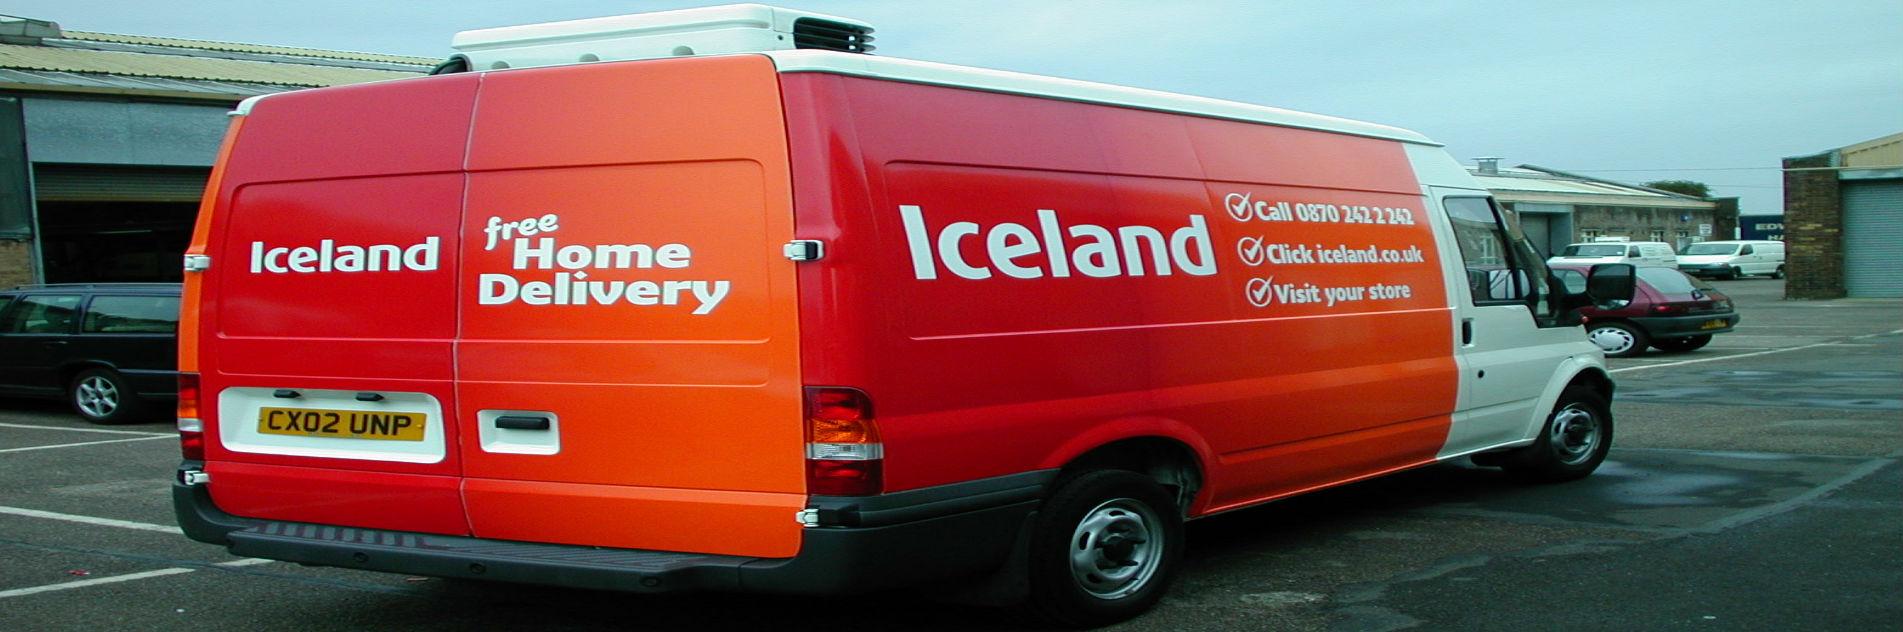 Iceland Van (Banner)